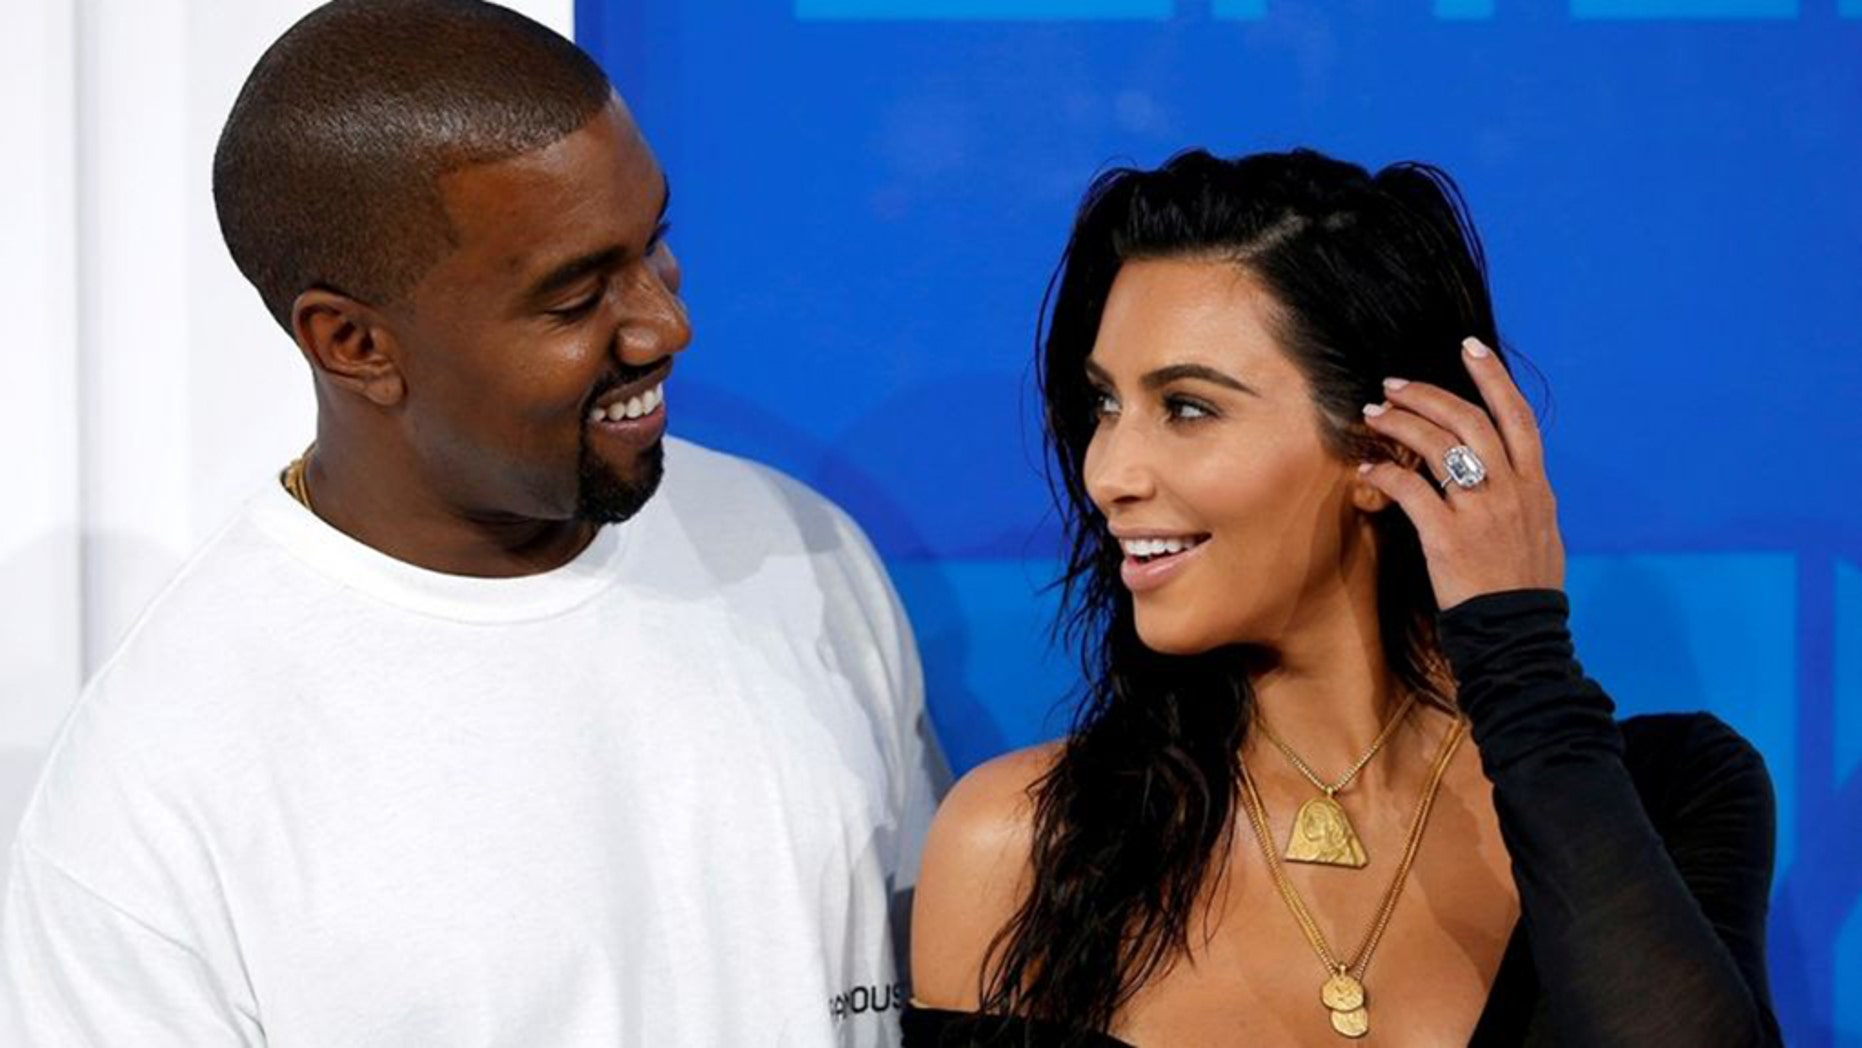 Paul McCartney said Kanye West would look at photos of Kim Kardashian while writing songs.